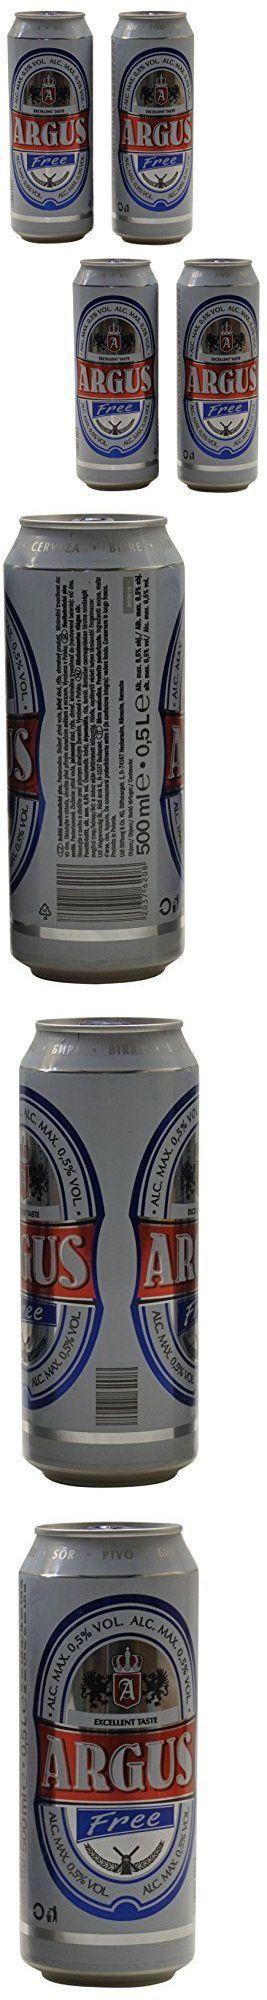 Soft Drinks 179188: Argus: Free Non Alcohol Malt Beer Taste Beverage 50Cl 16.9Oz Pack Of 4 Italian -> BUY IT NOW ONLY: $126 on eBay!